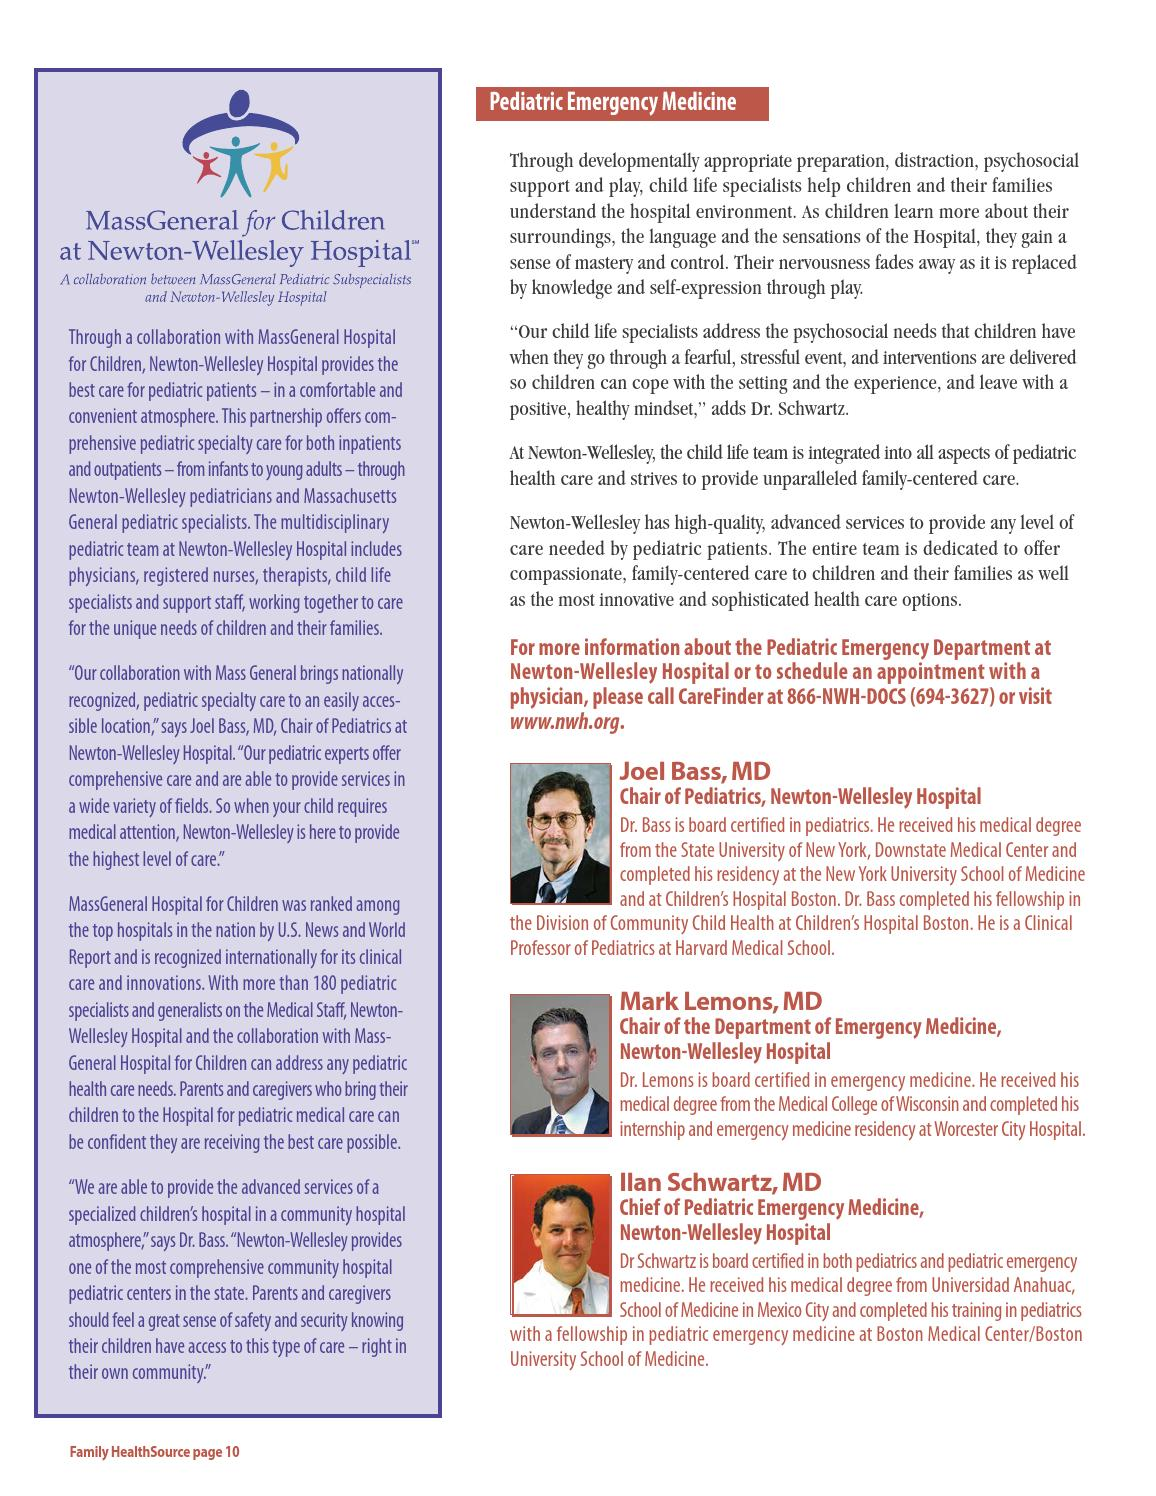 NWH HealthSource: Summer 2016 by newtonwellesleyhospital - issuu